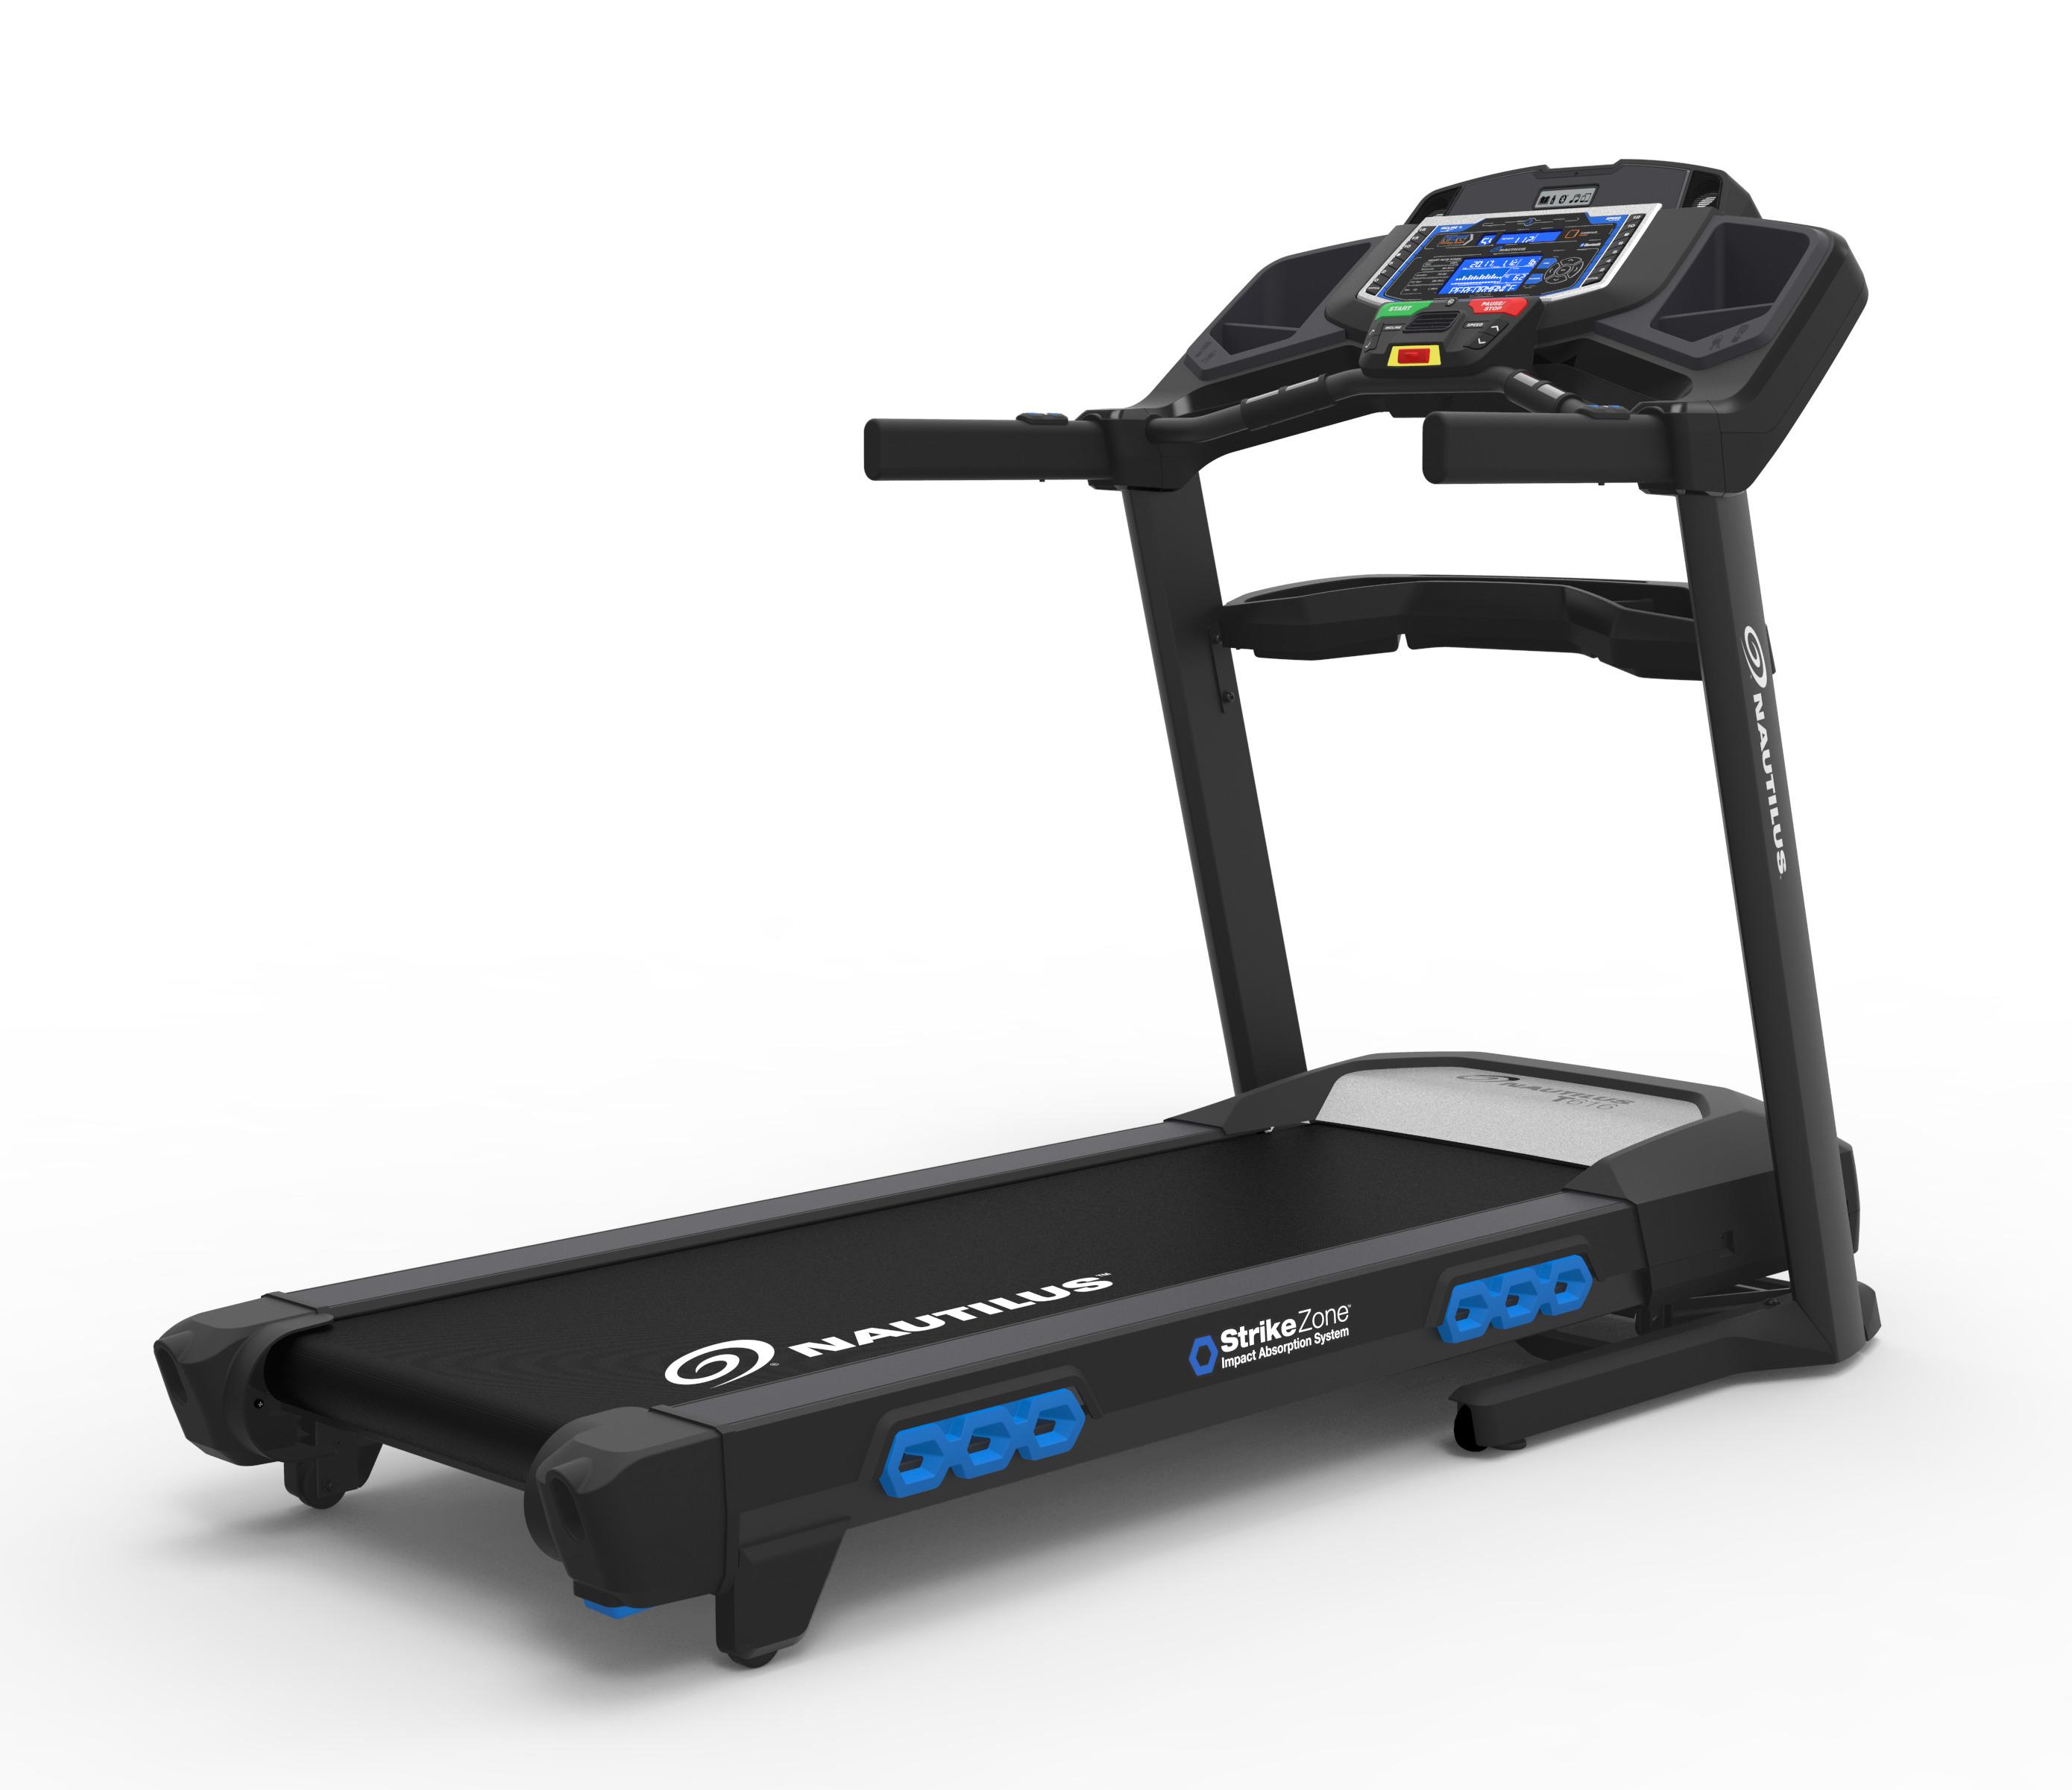 Nautilus T616 Bluetooth Treadmill with RunSocial & Nautilus Trainer 2 App Connectivity by Nautilus